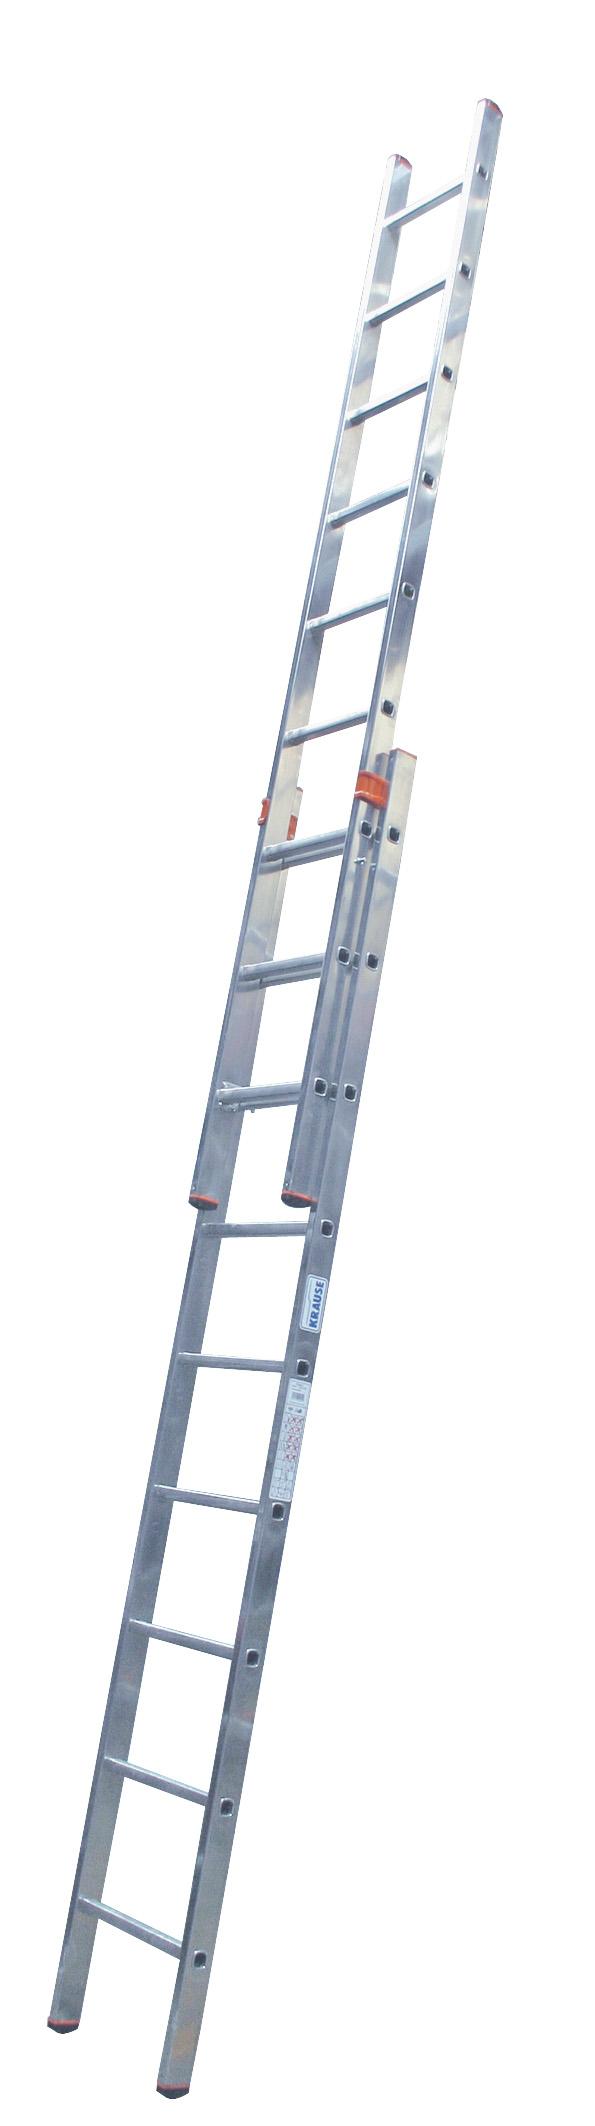 Лестница алюминиевая выдвижная Krause